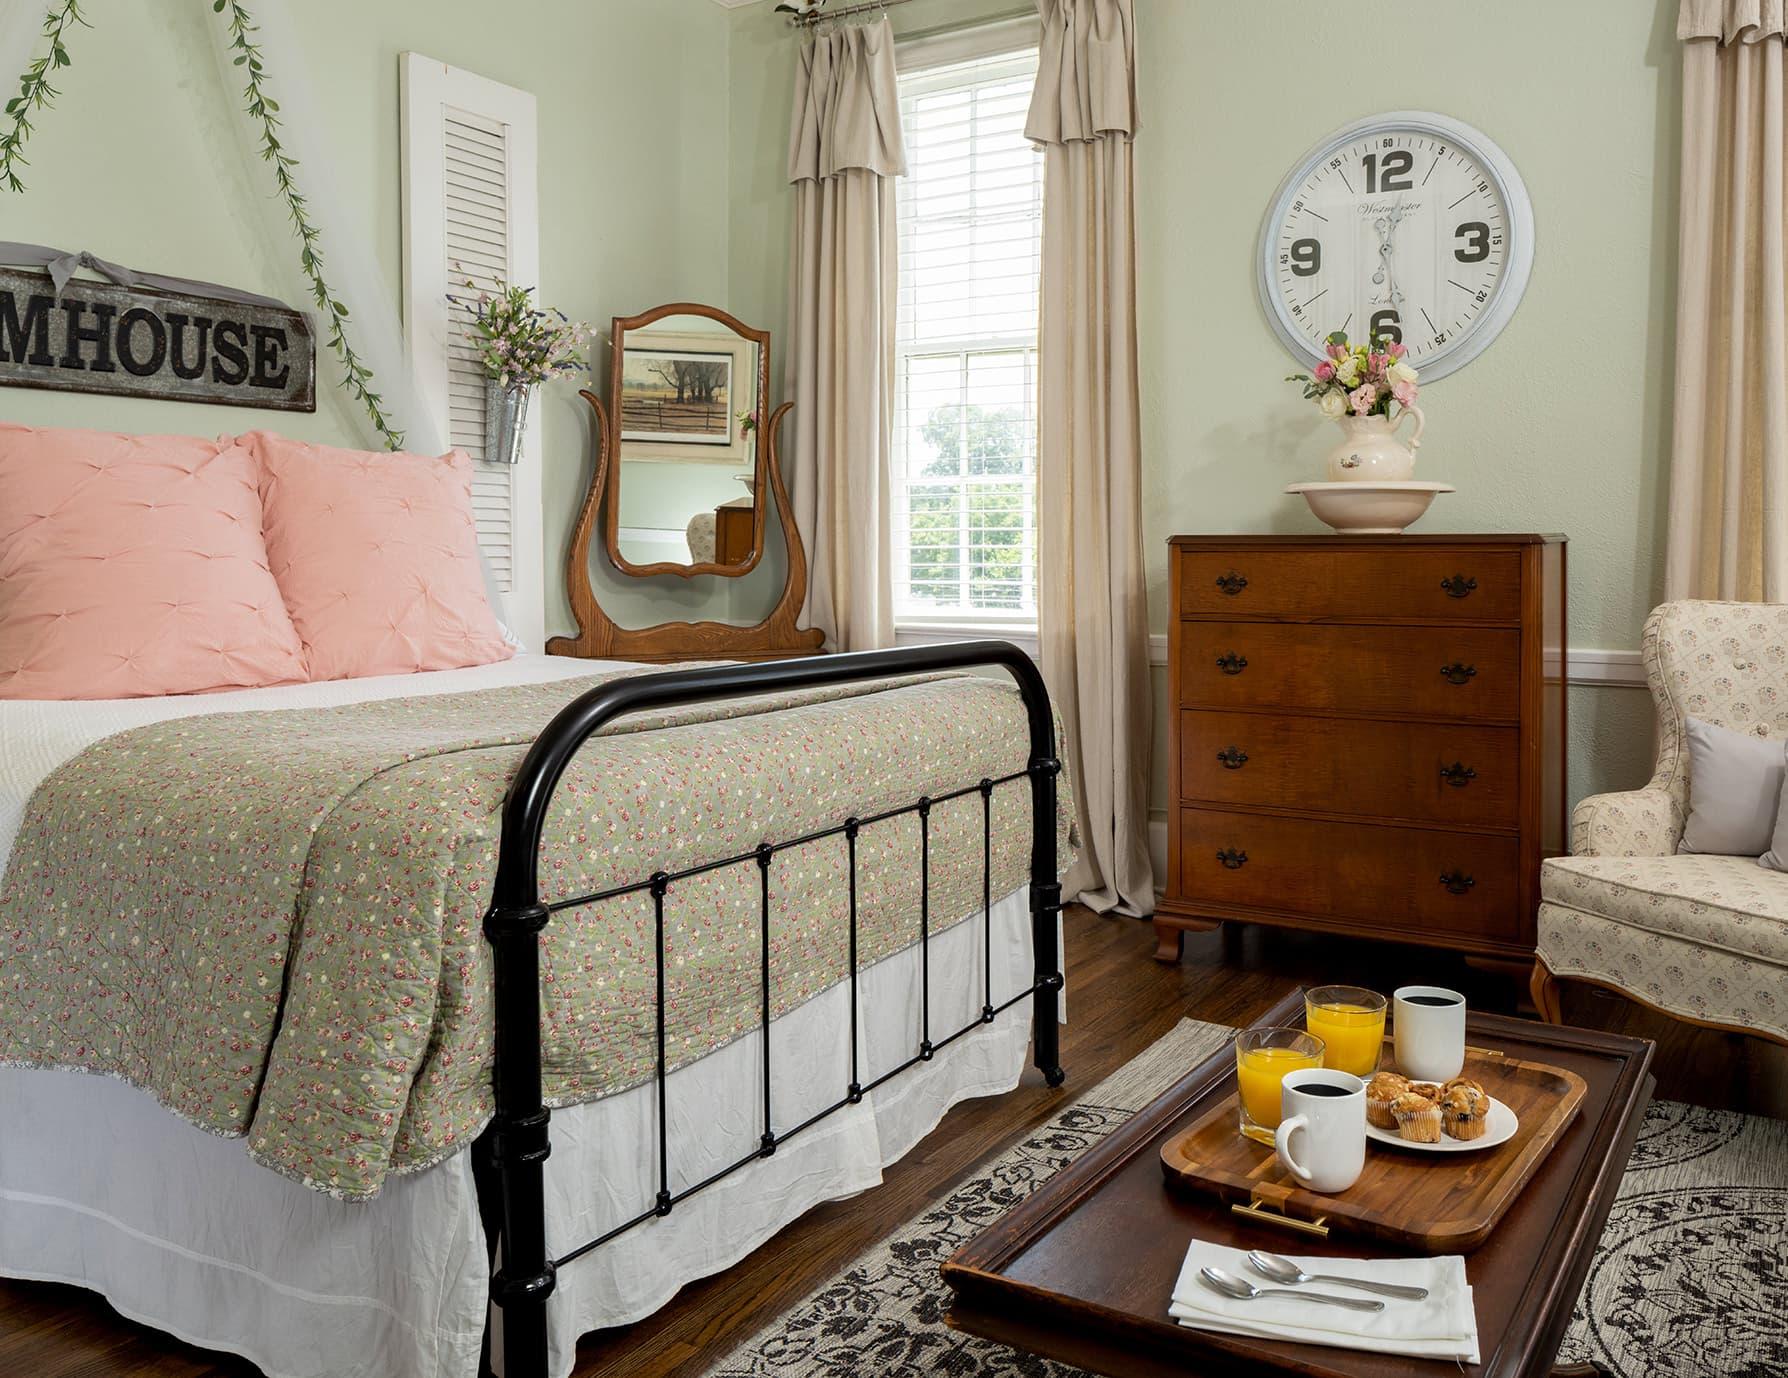 Suite Magnolia bed at our B&B getaway near Memphis